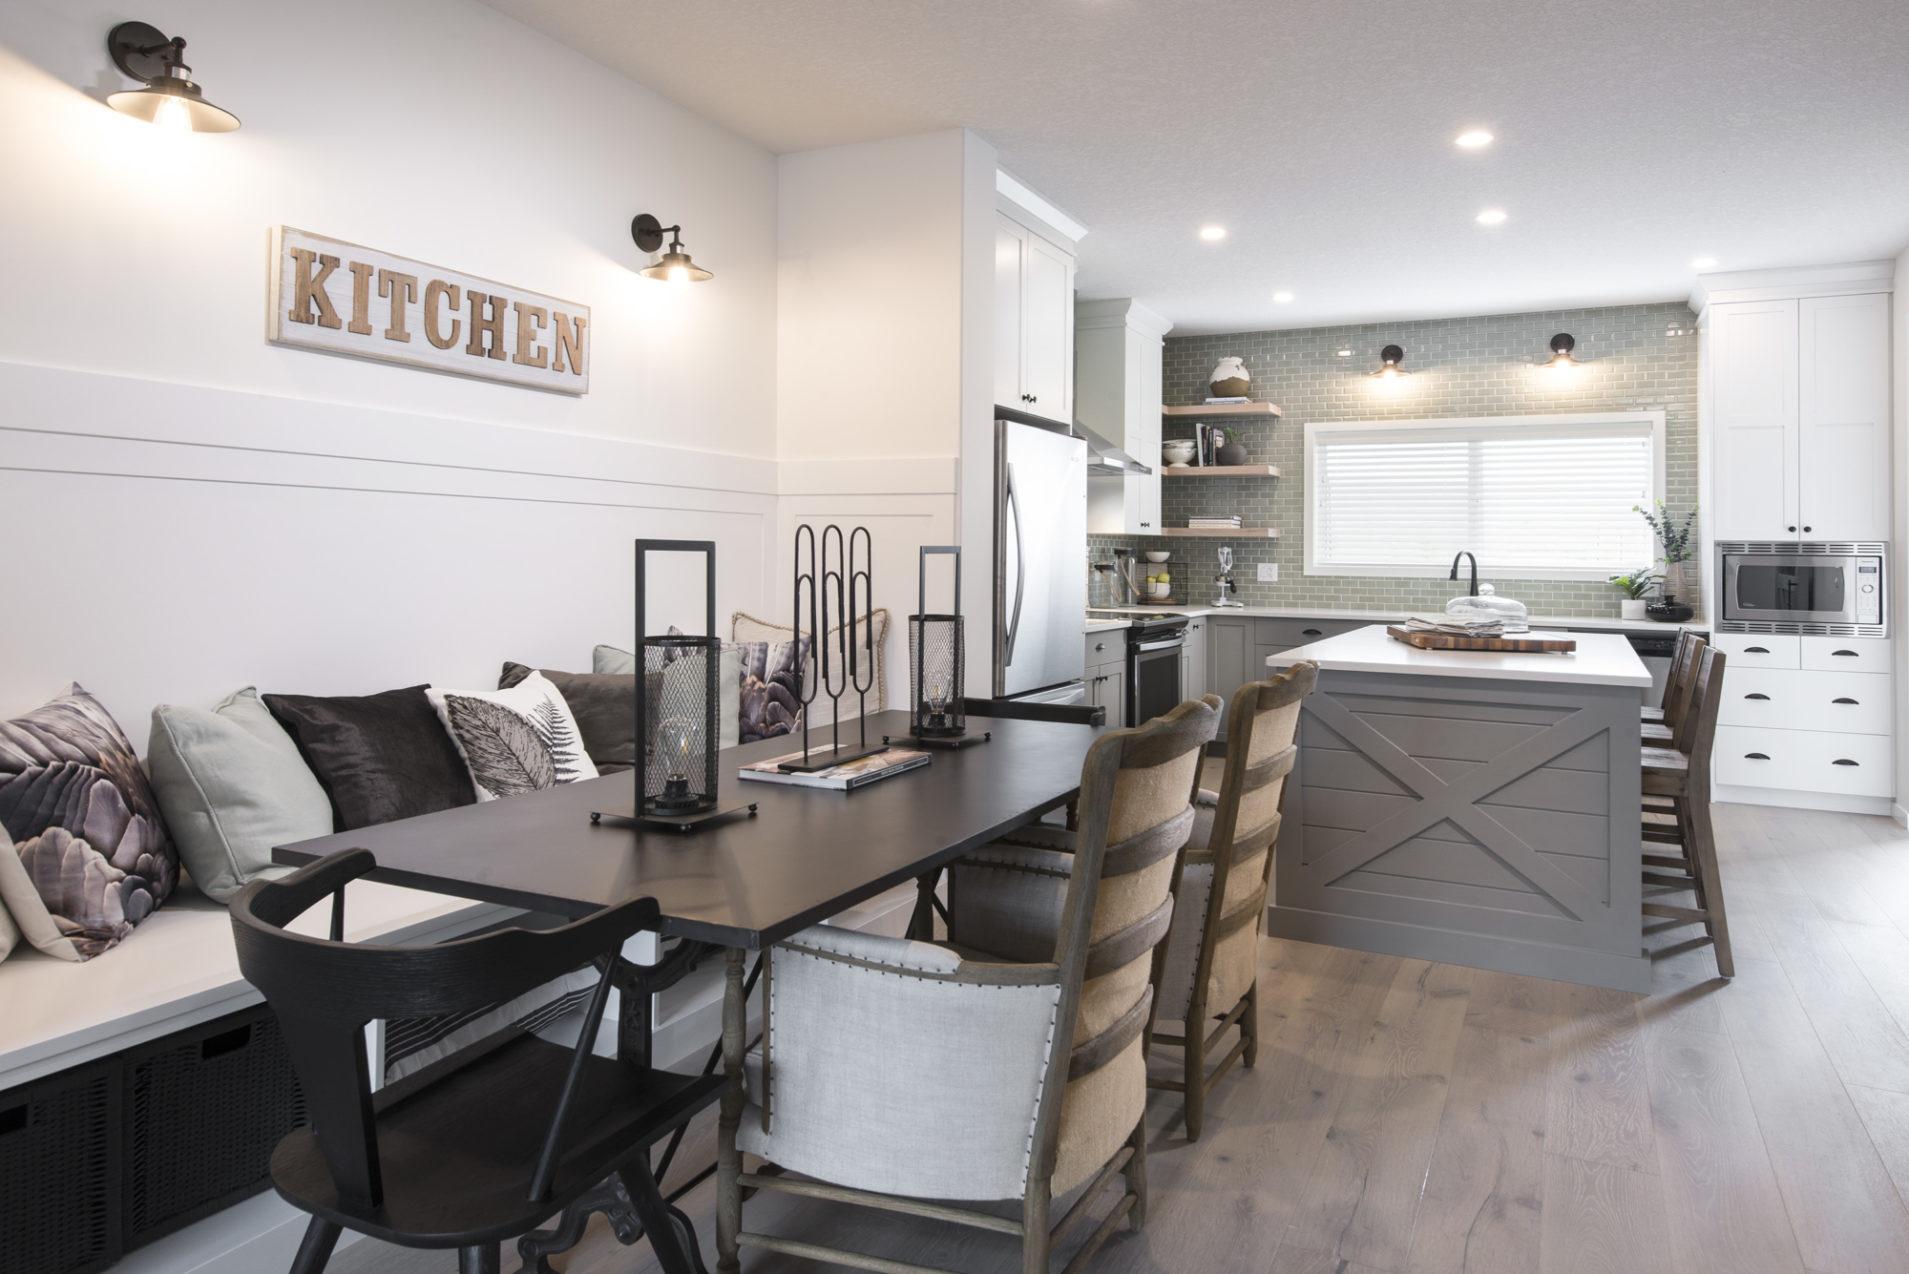 5 Morrisonhomes Belmont Blakely Showhome Kitchen2 2018